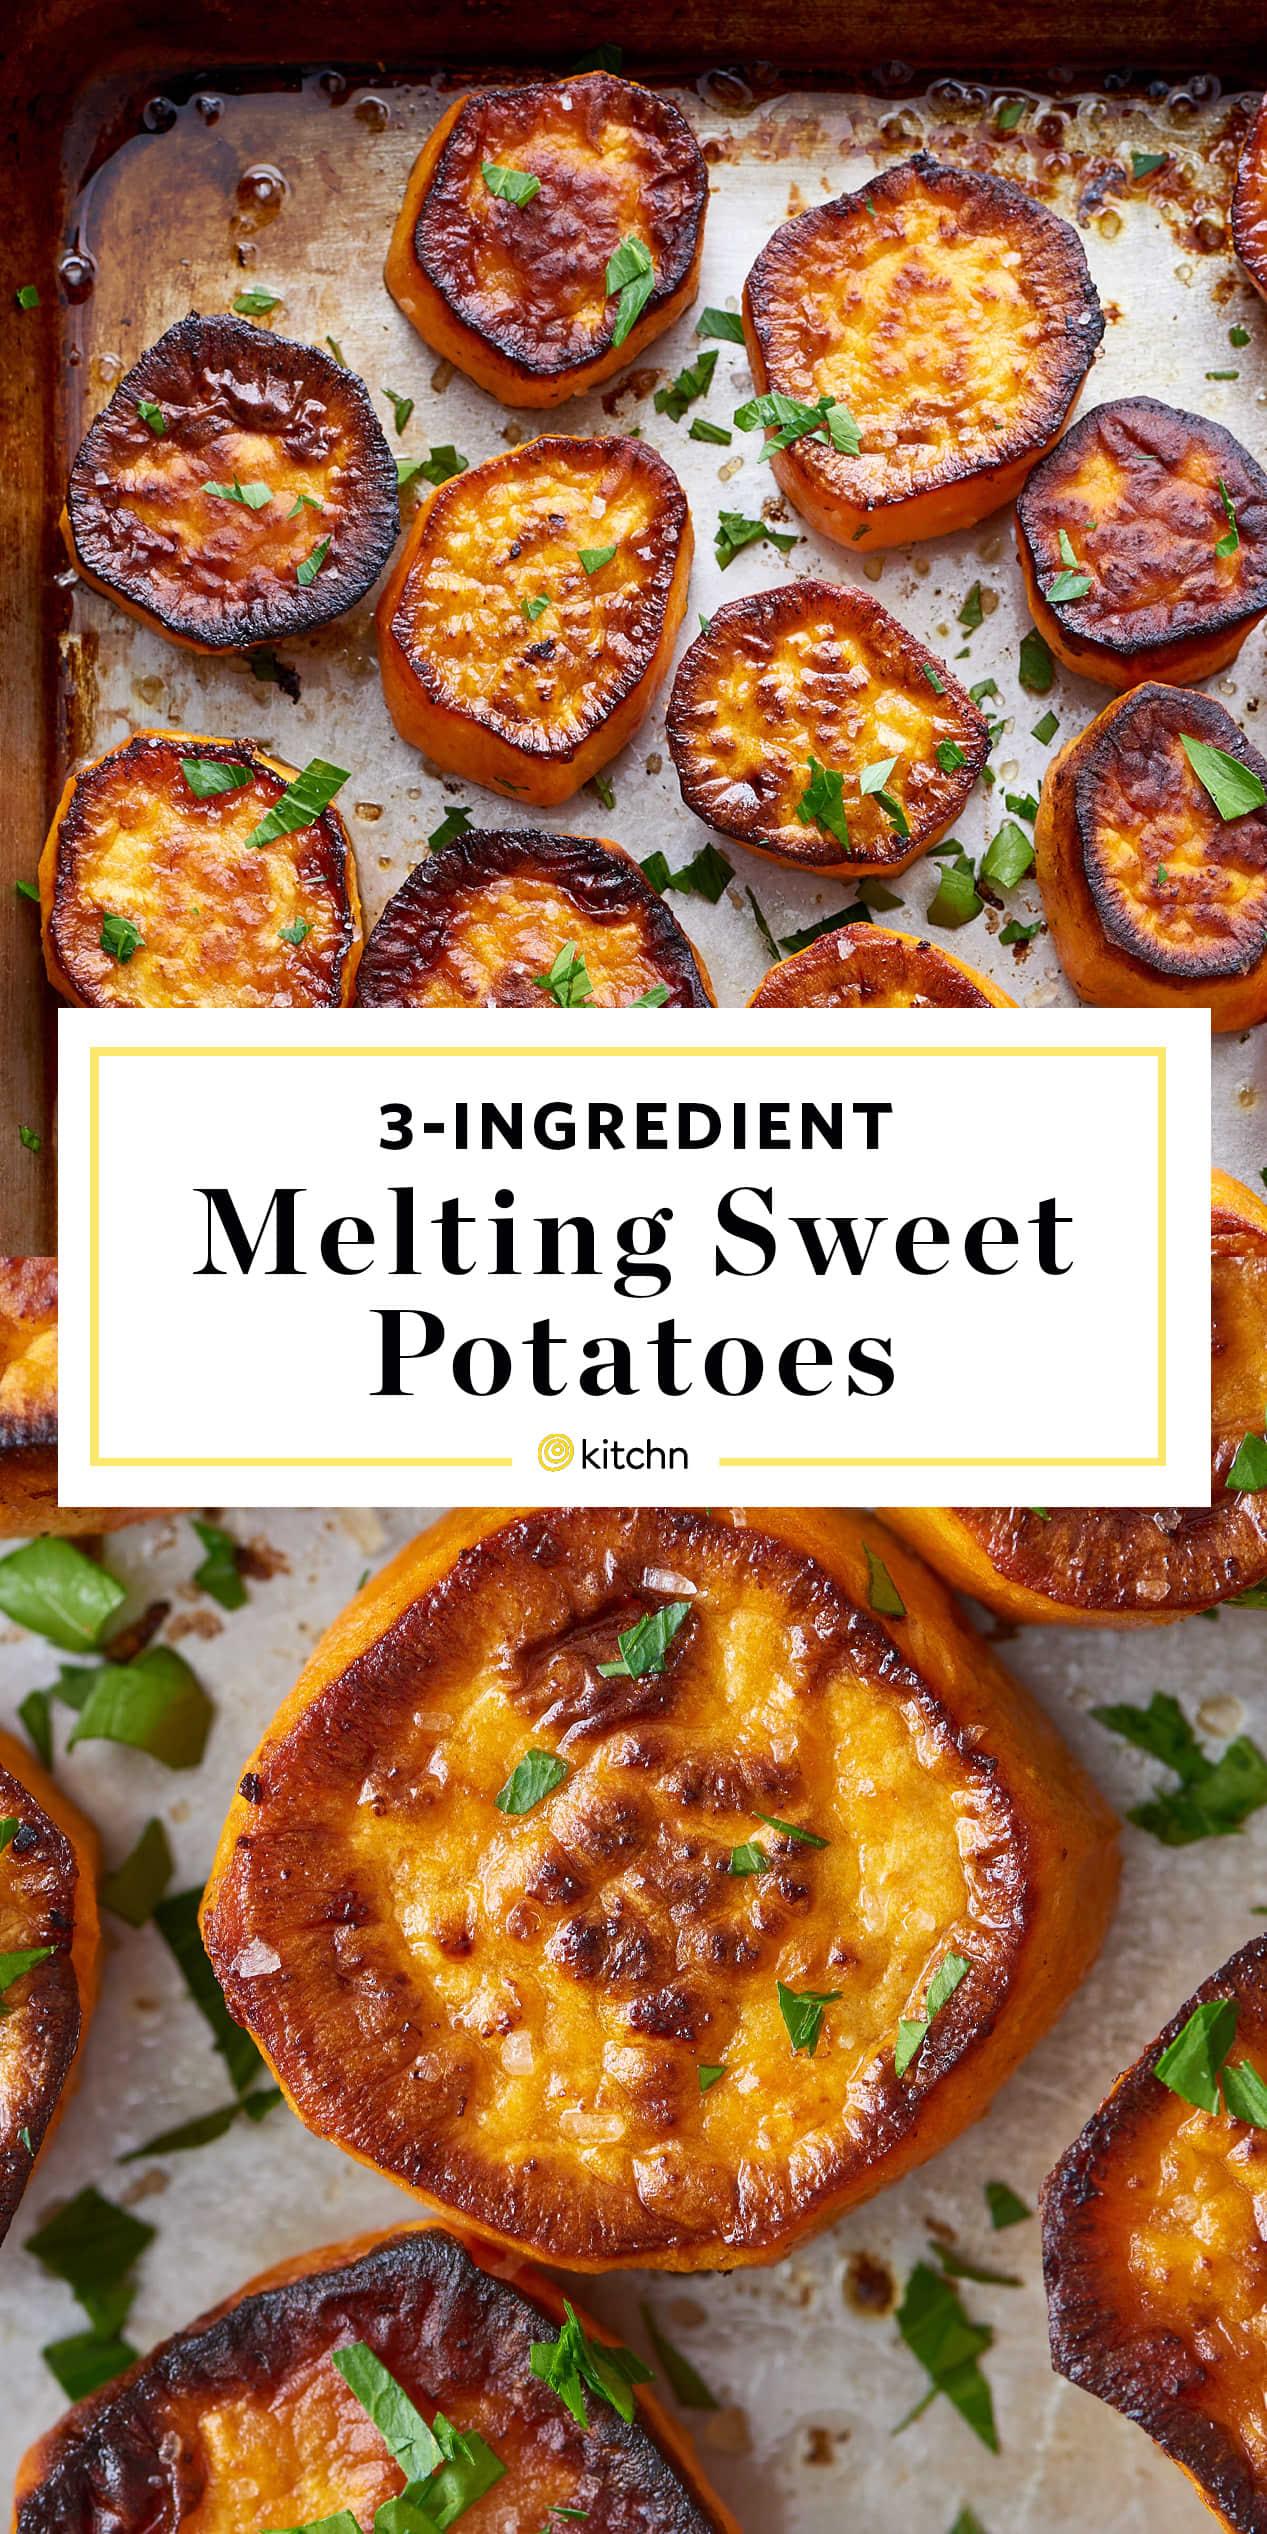 Melting Sweet Potatoes Recipe